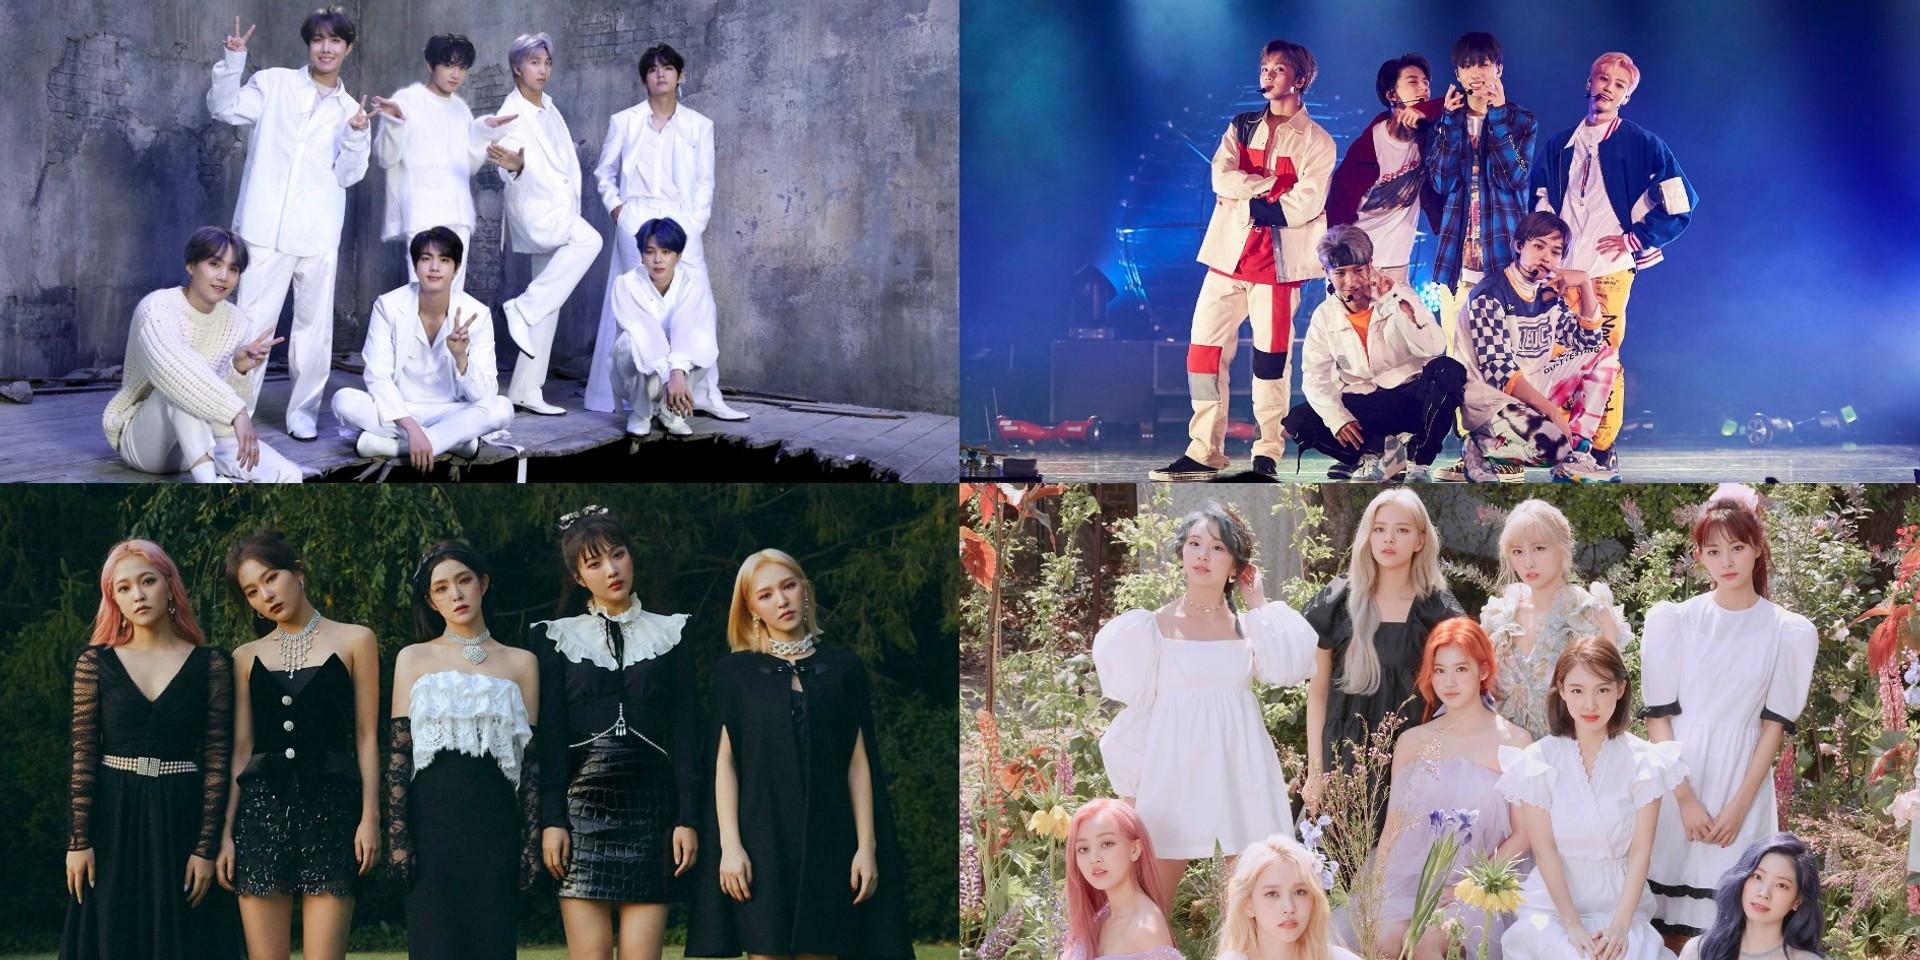 Here are the winners of the 2020 Soribada Best K-Music Awards